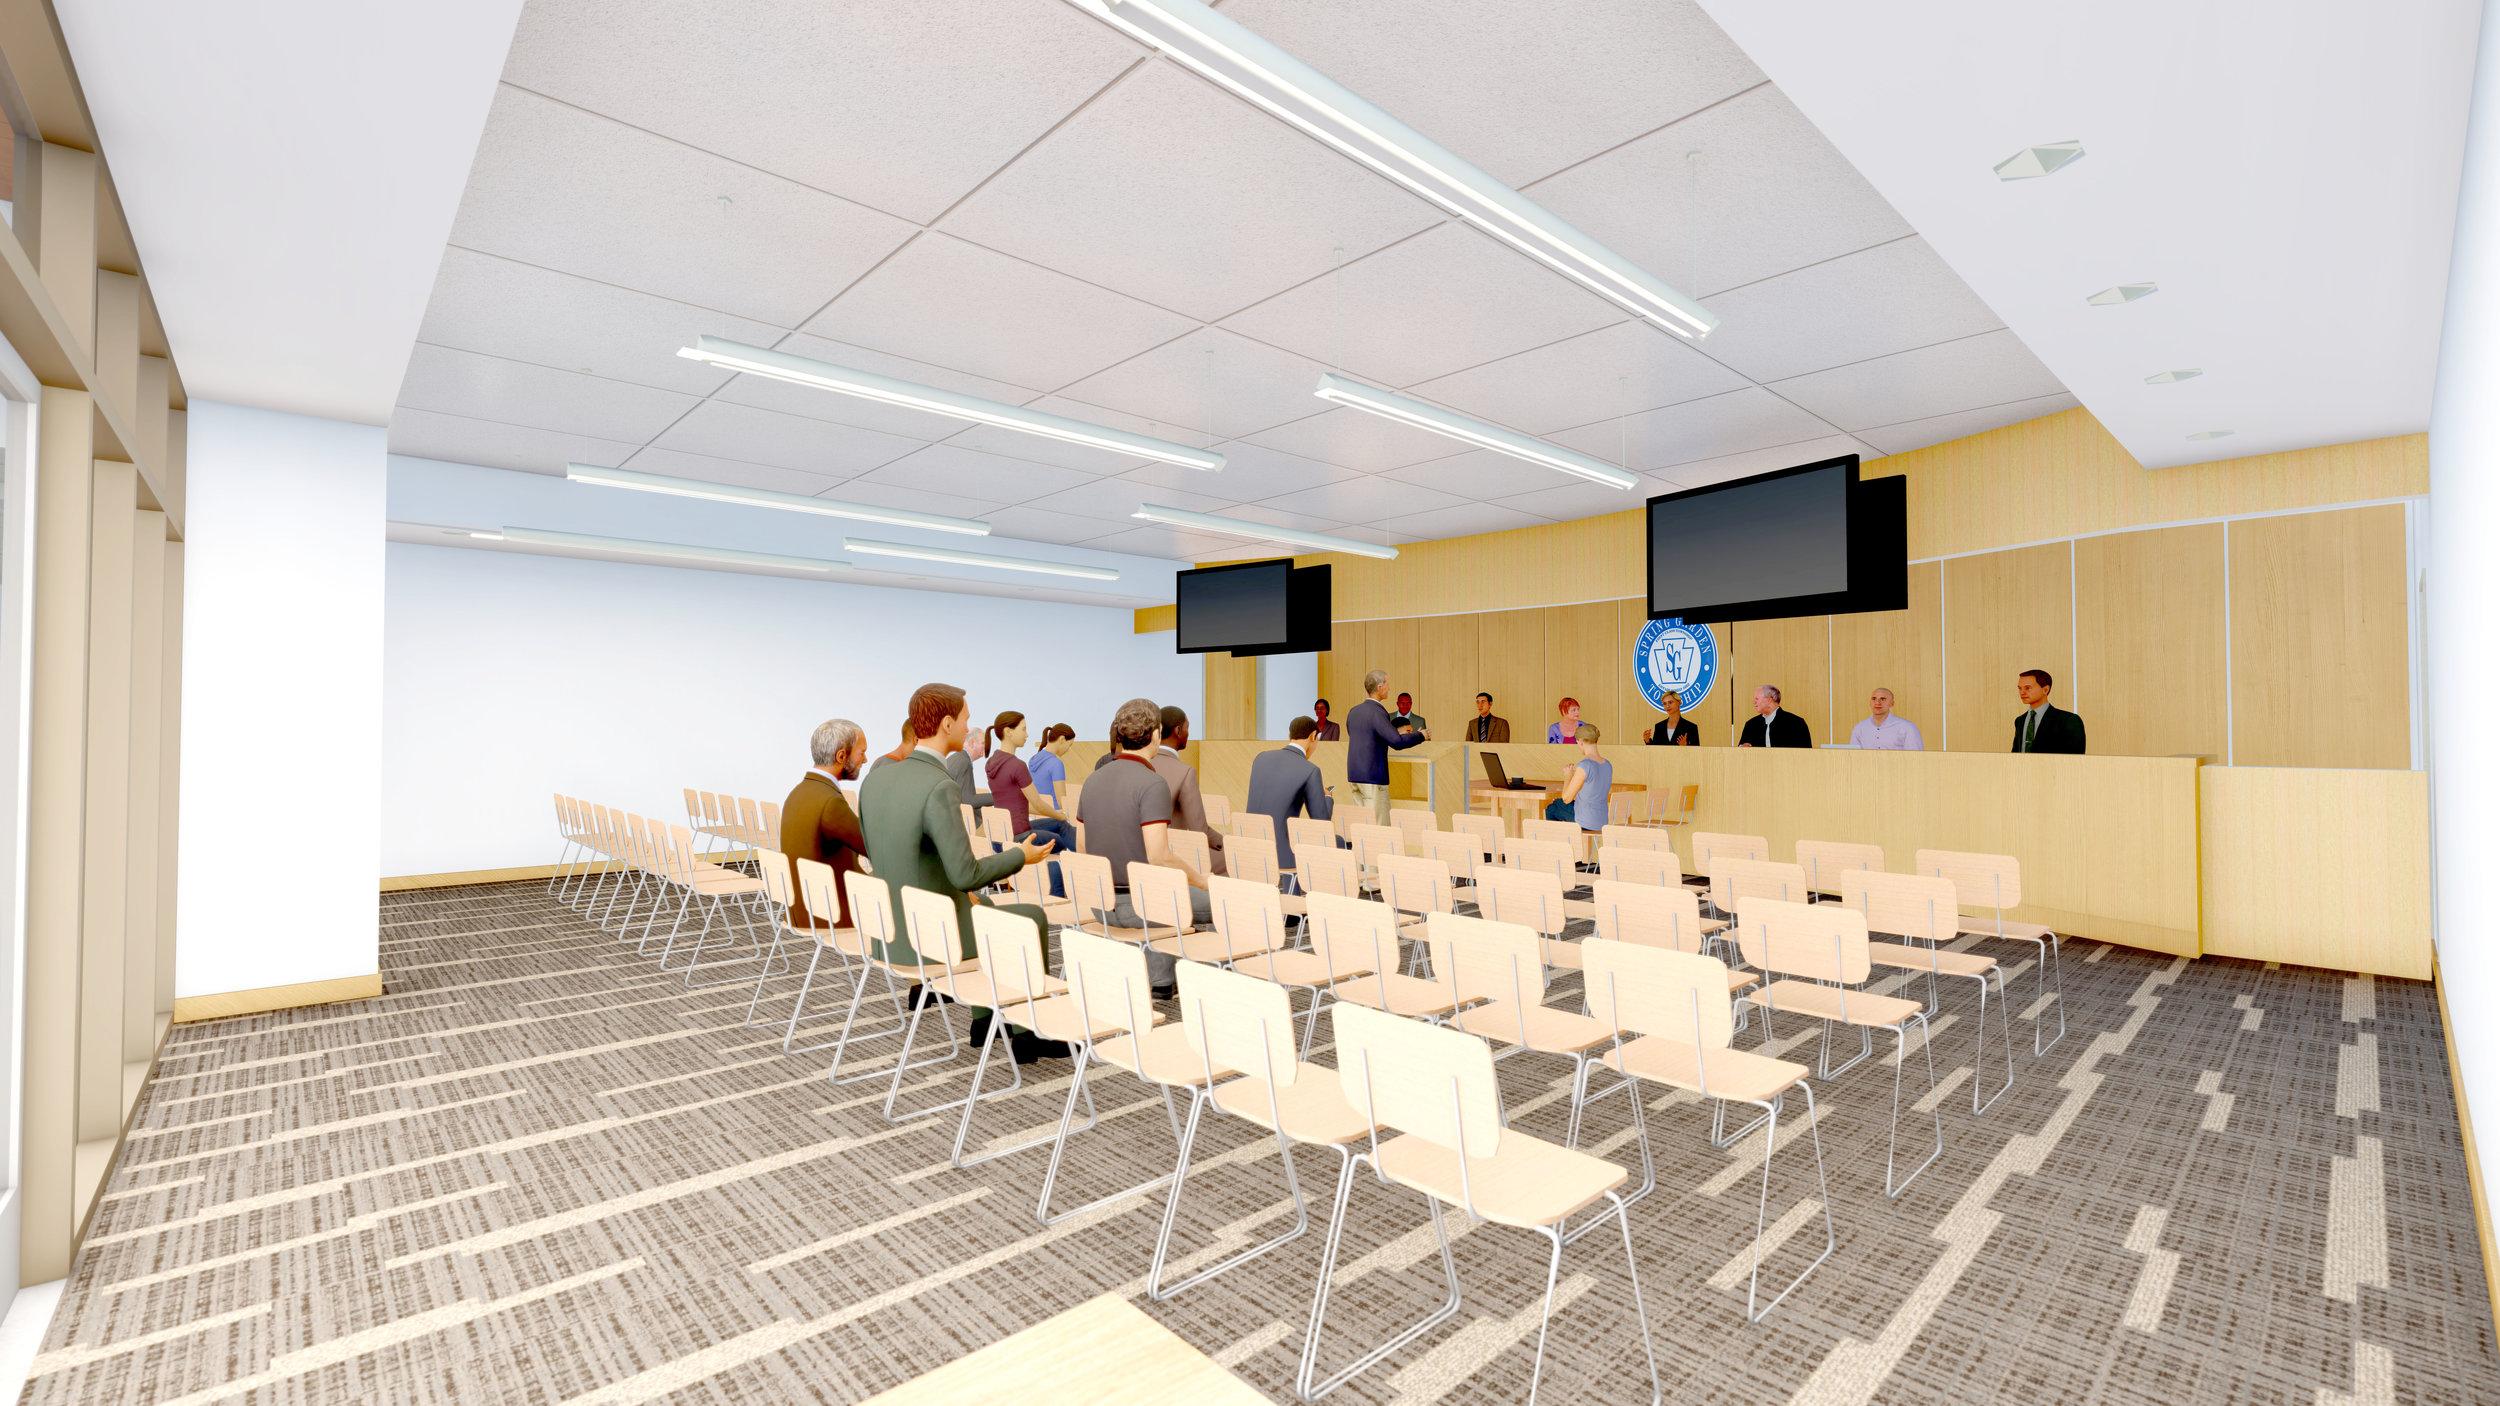 Meeting Room Interior.jpg